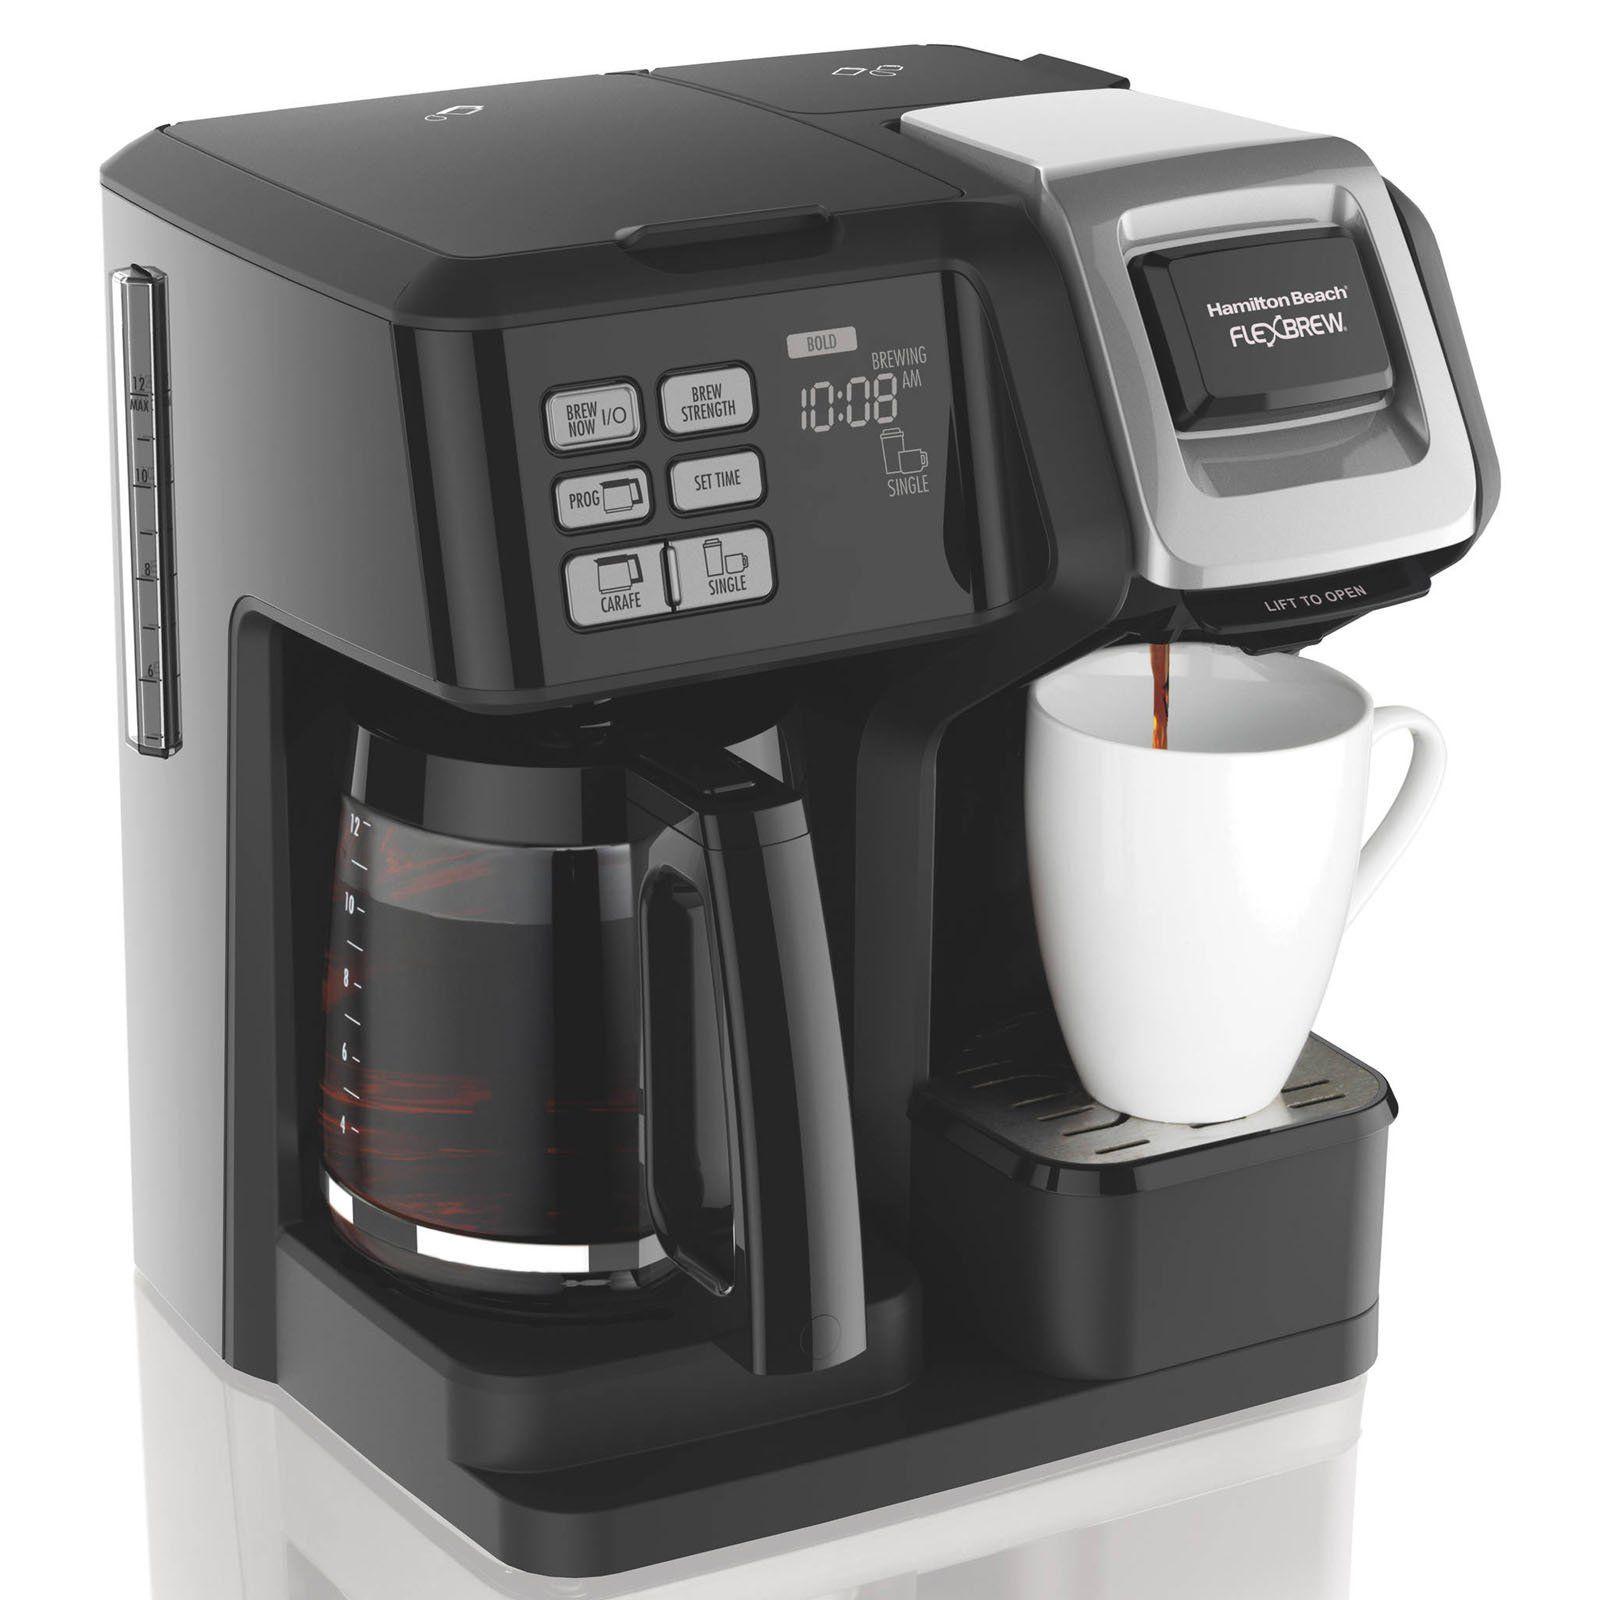 Hamilton Beach 49976 Flexbrew 2 Way Coffee Maker Coffee Maker Best Coffee Maker 1 Cup Coffee Maker